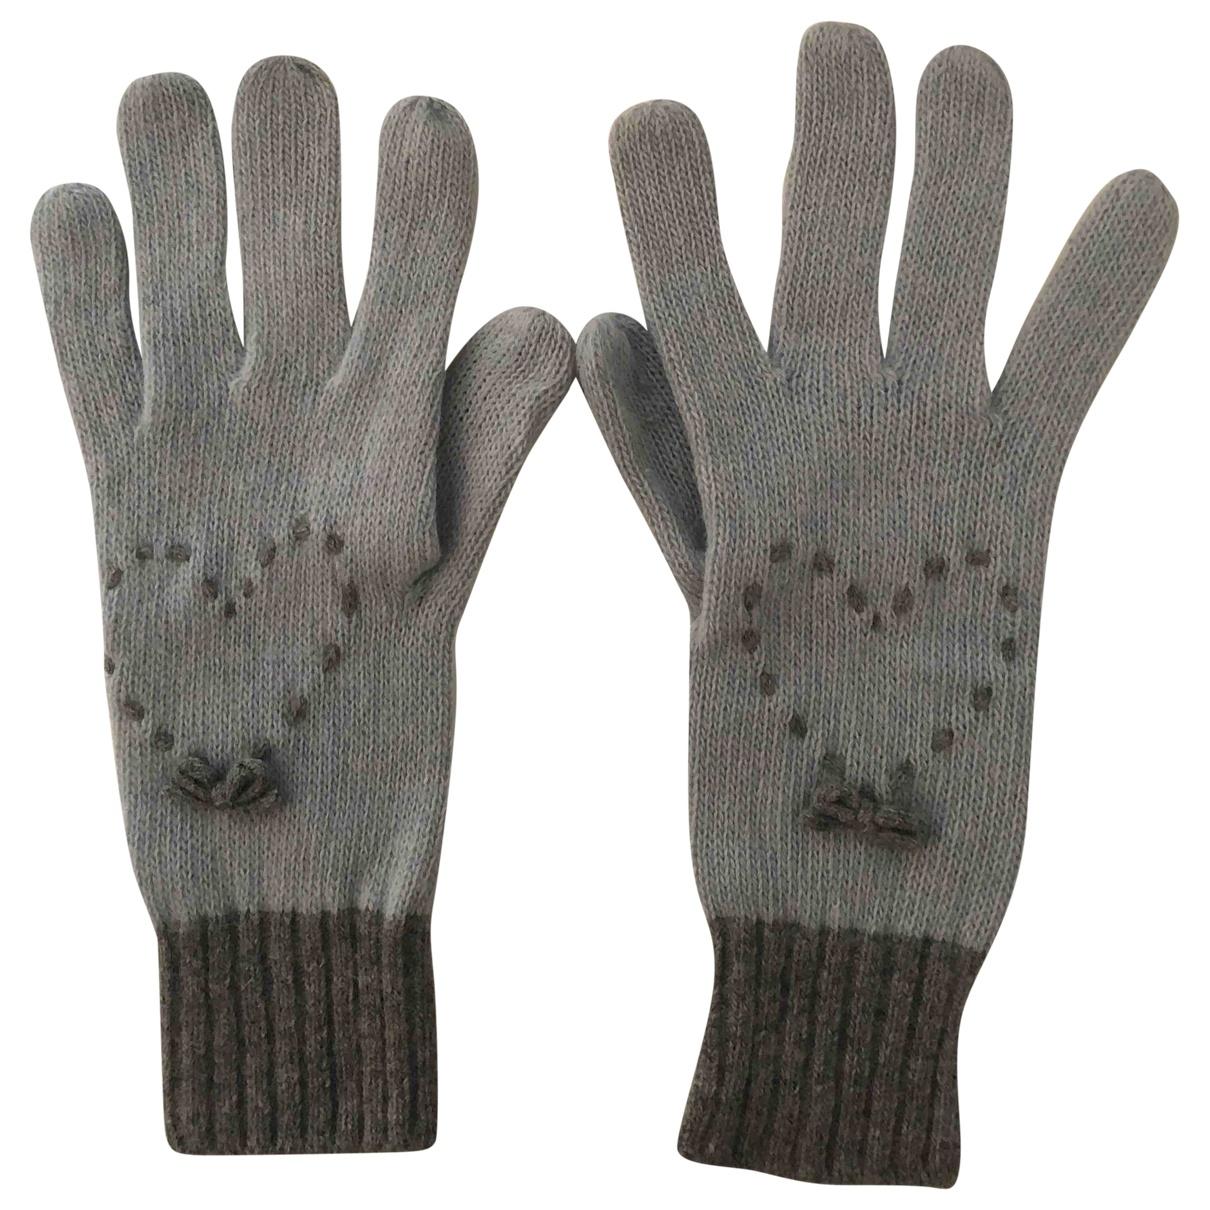 Moschino \N Grey Wool Gloves for Women S International